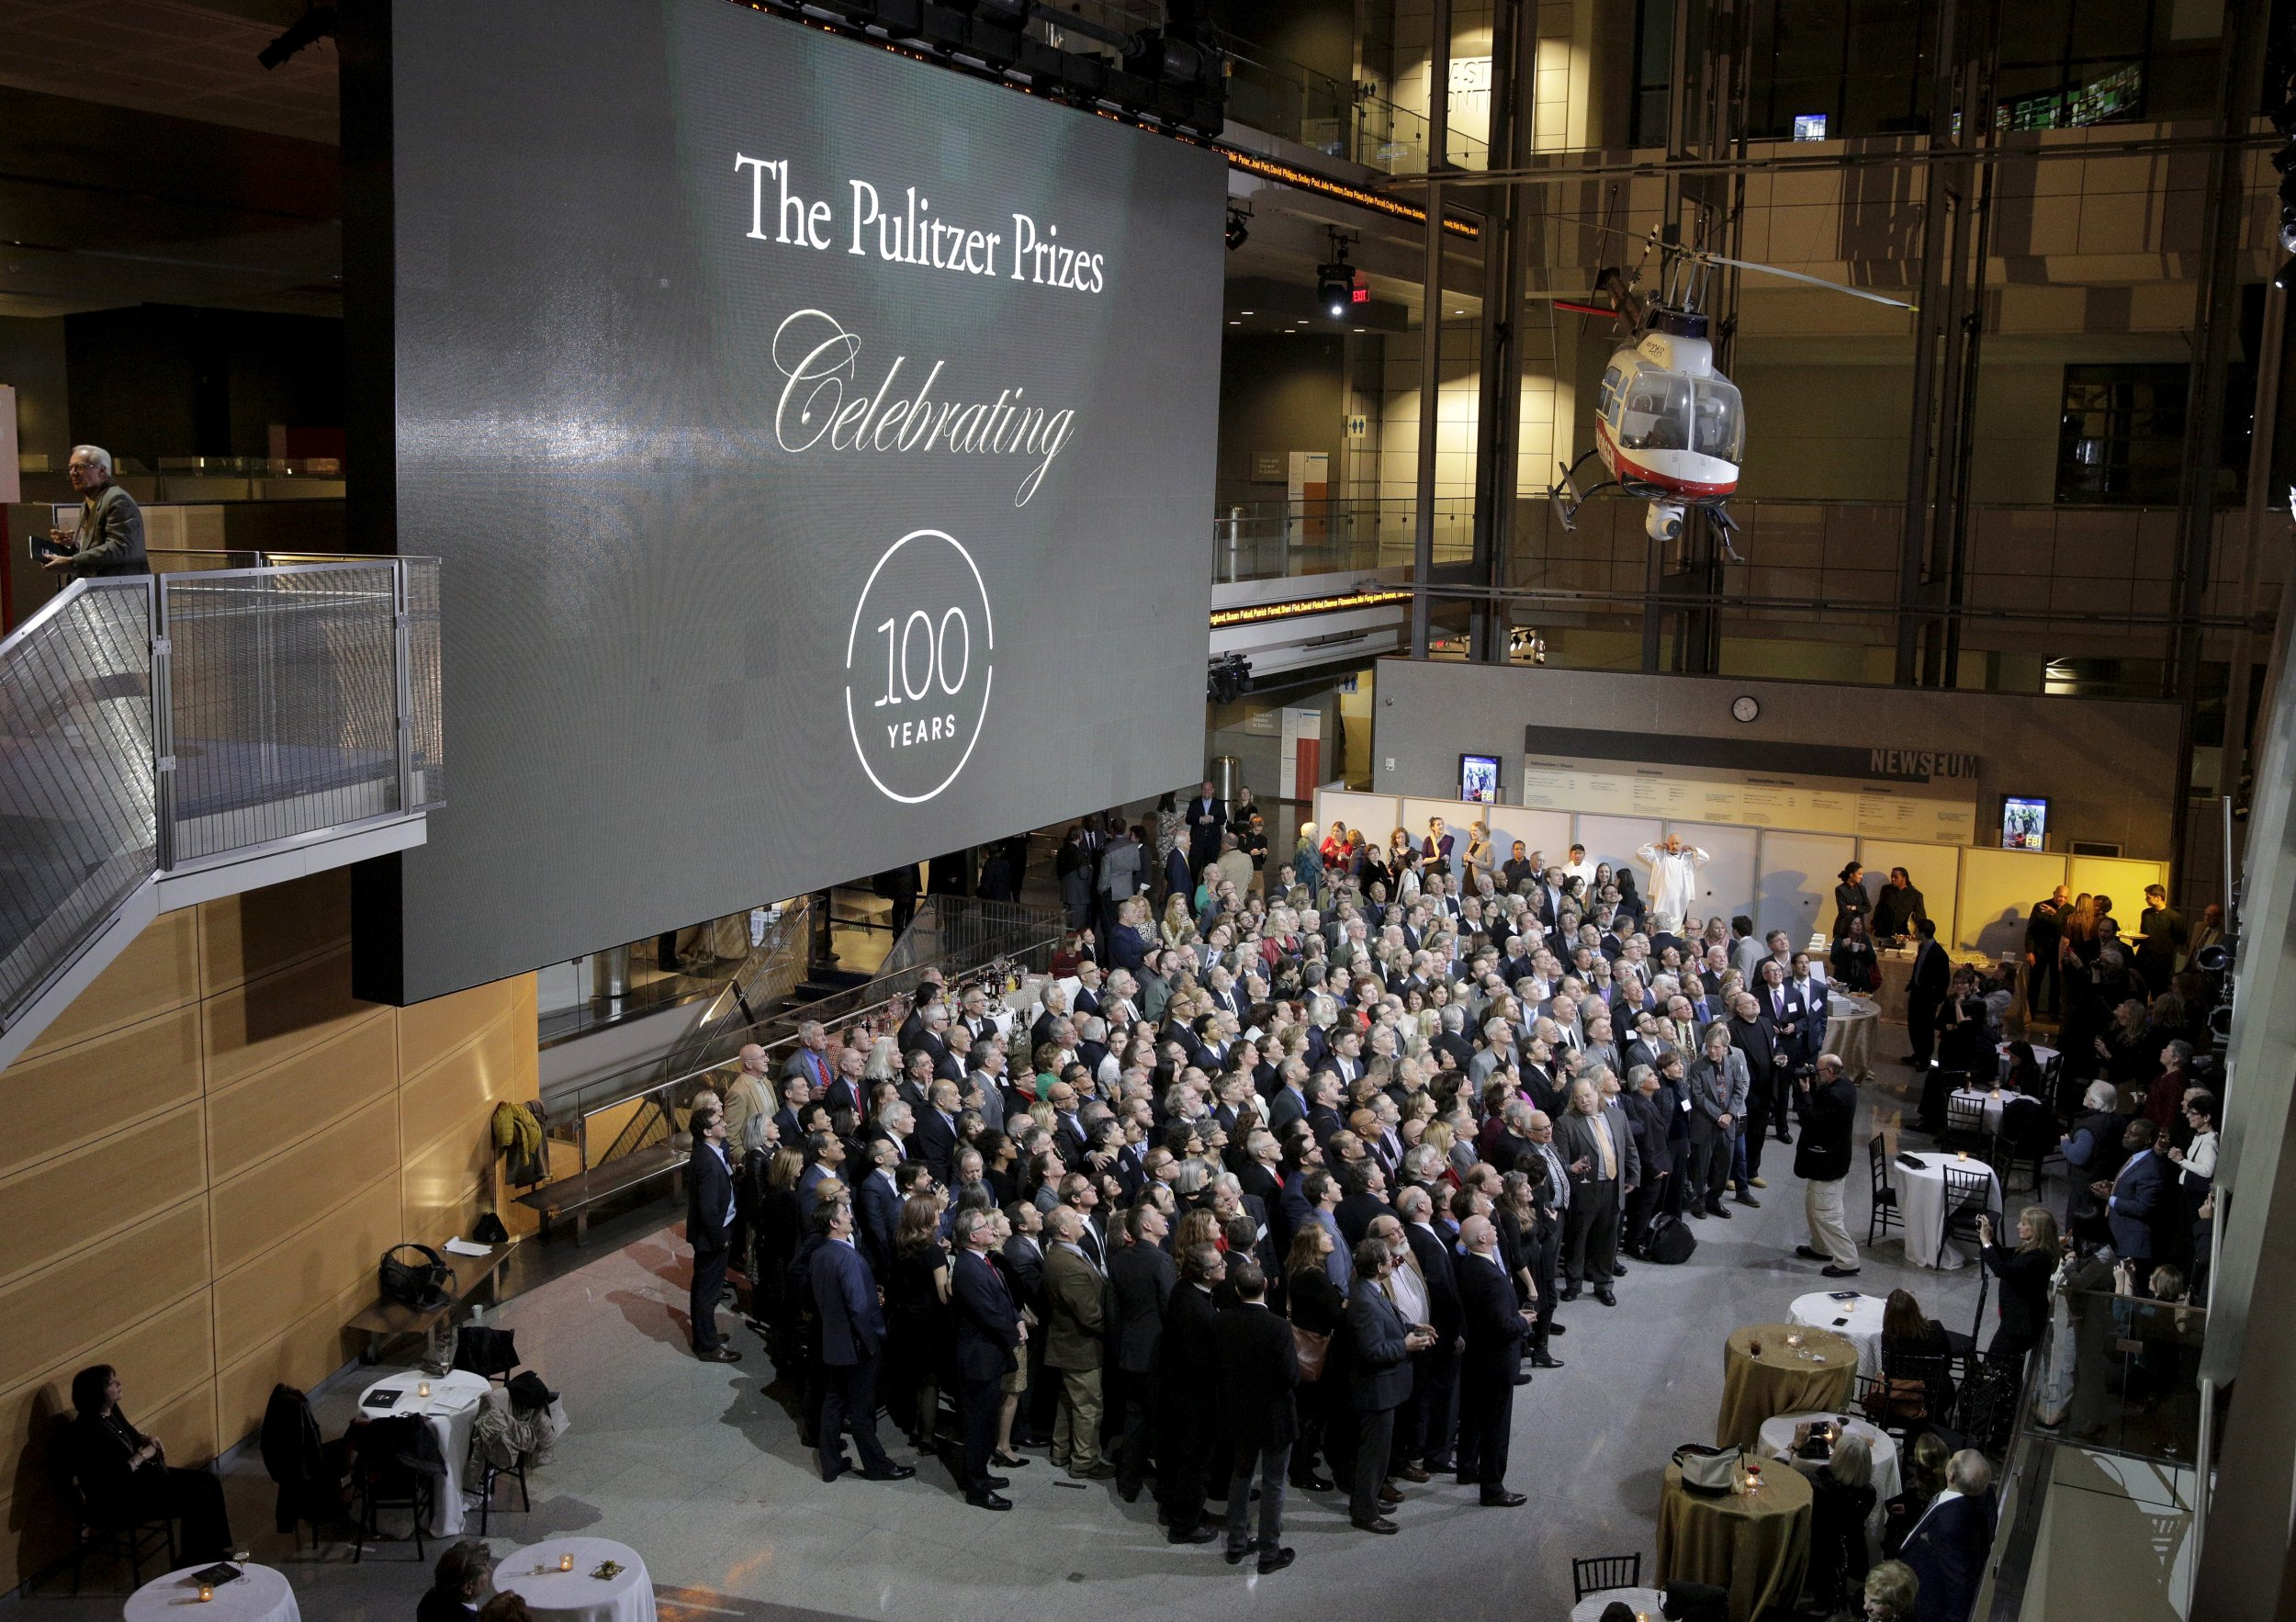 4-18-16 Pulitzer Prizes